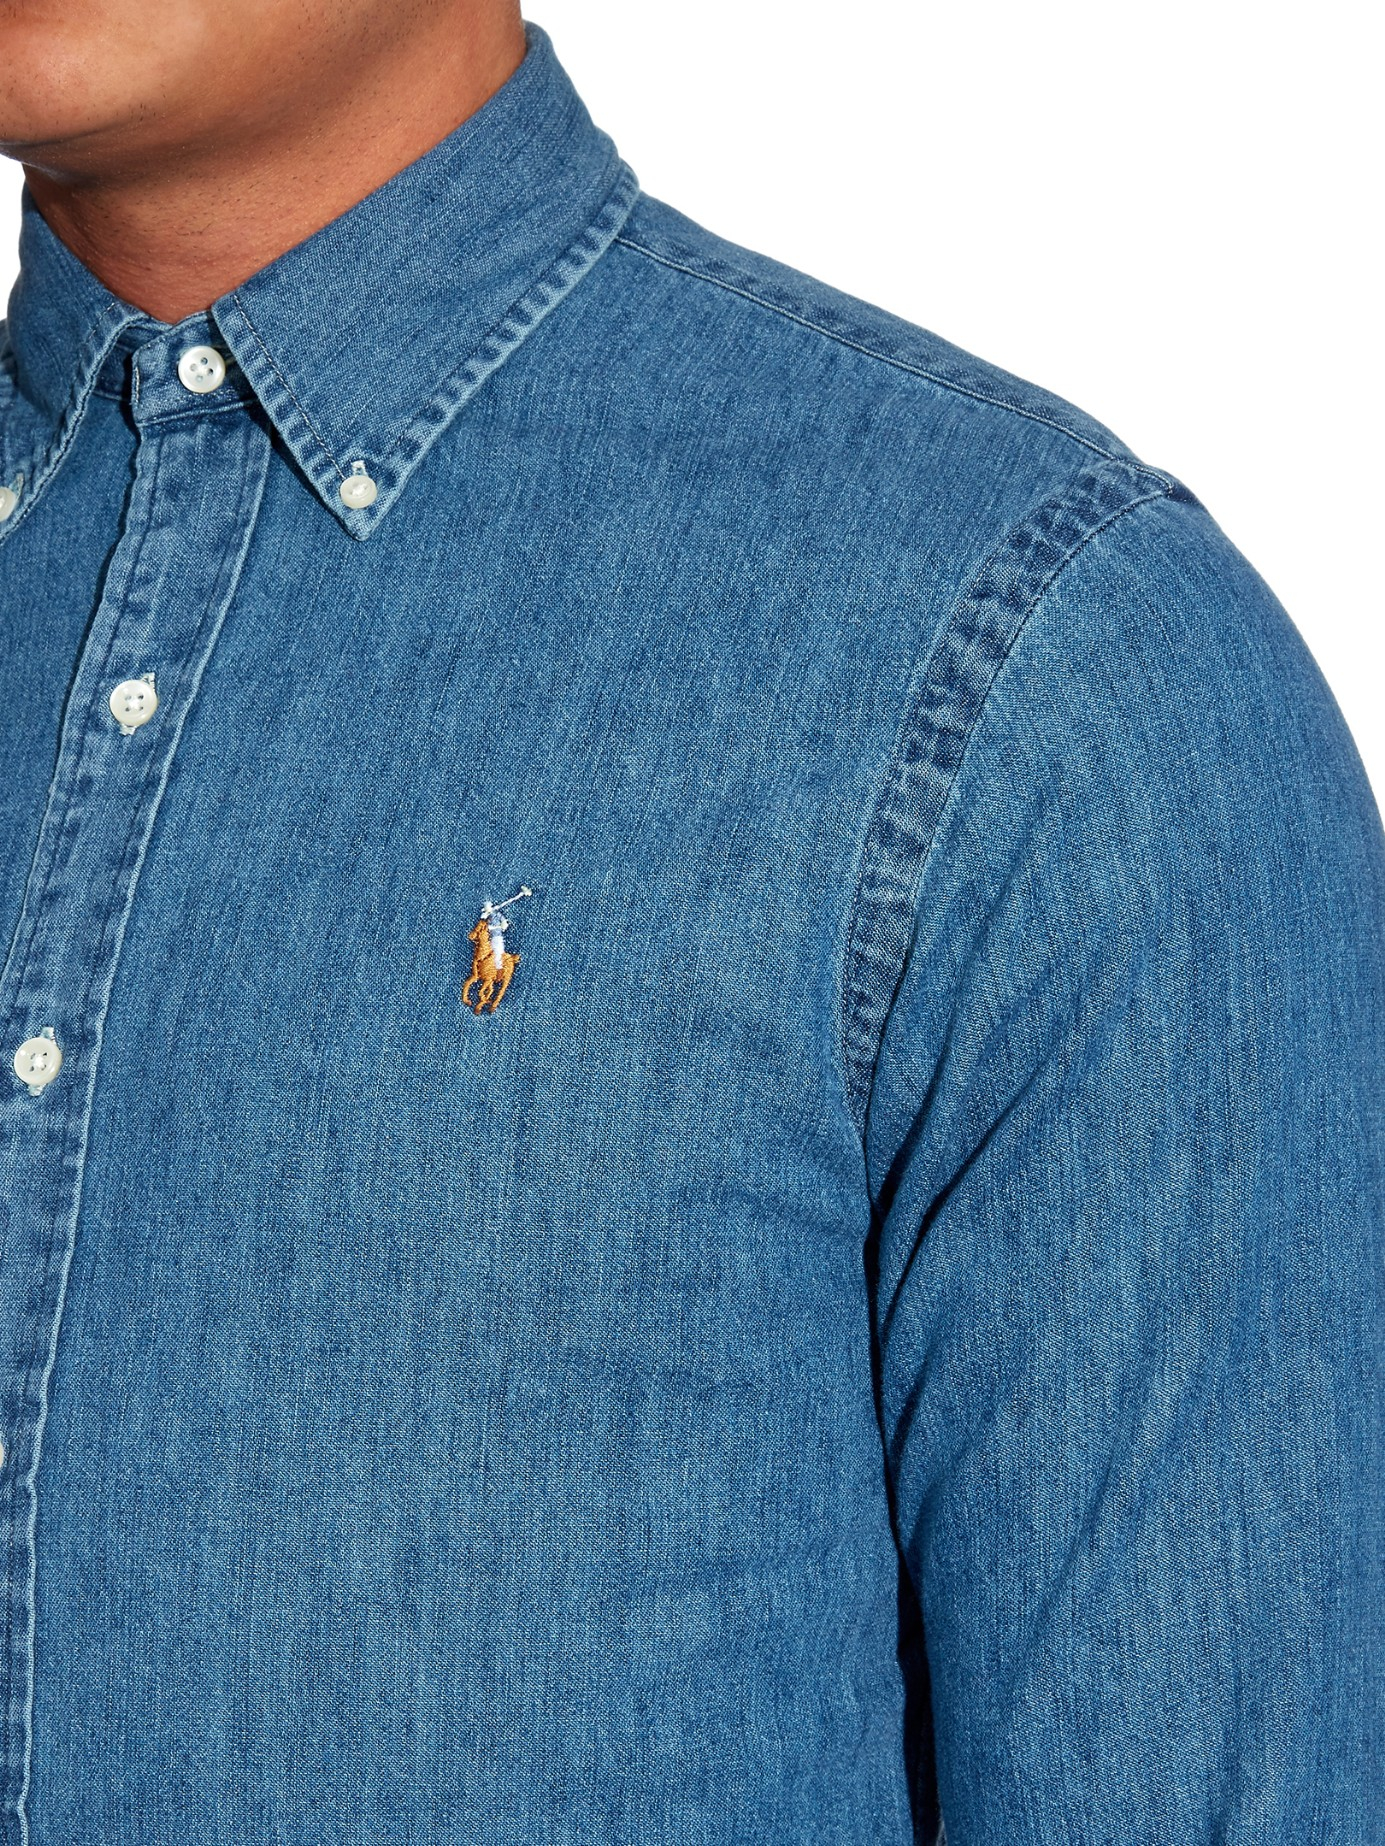 54babc61035 Polo Ralph Lauren - SLIM FIT - Shirt - dark wash · Gallery